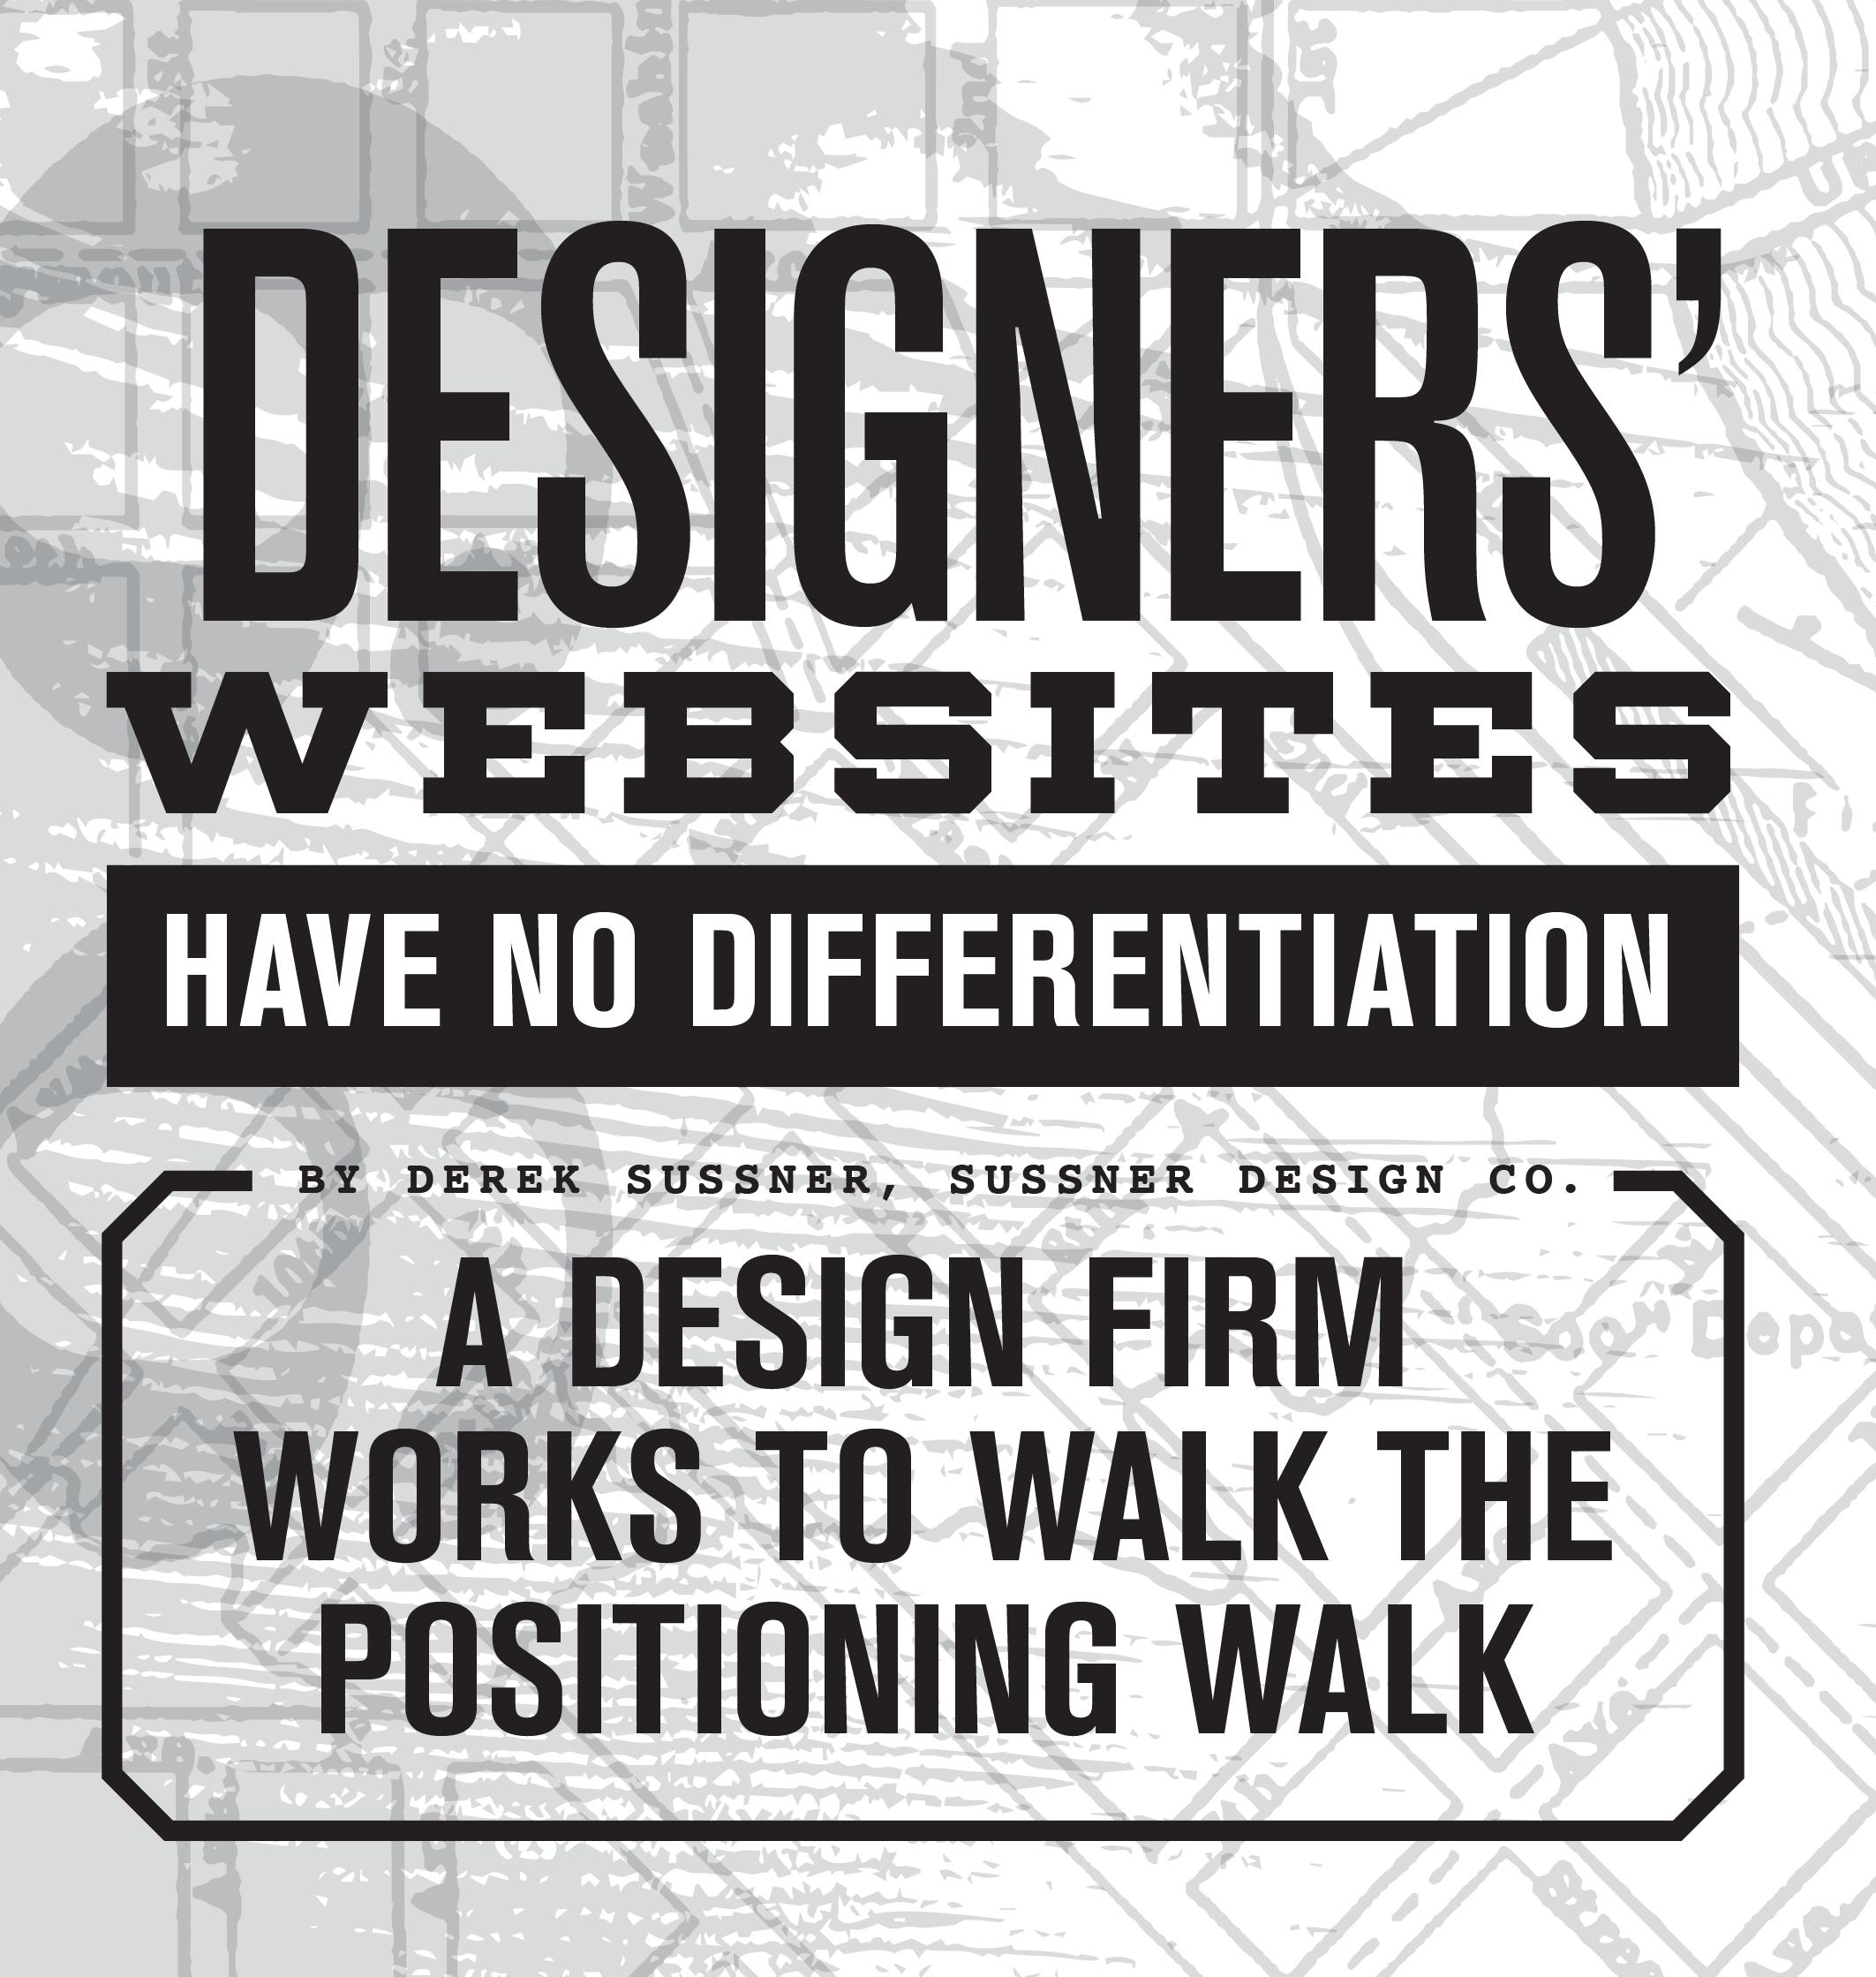 Designers' Websites Have No Differentiation